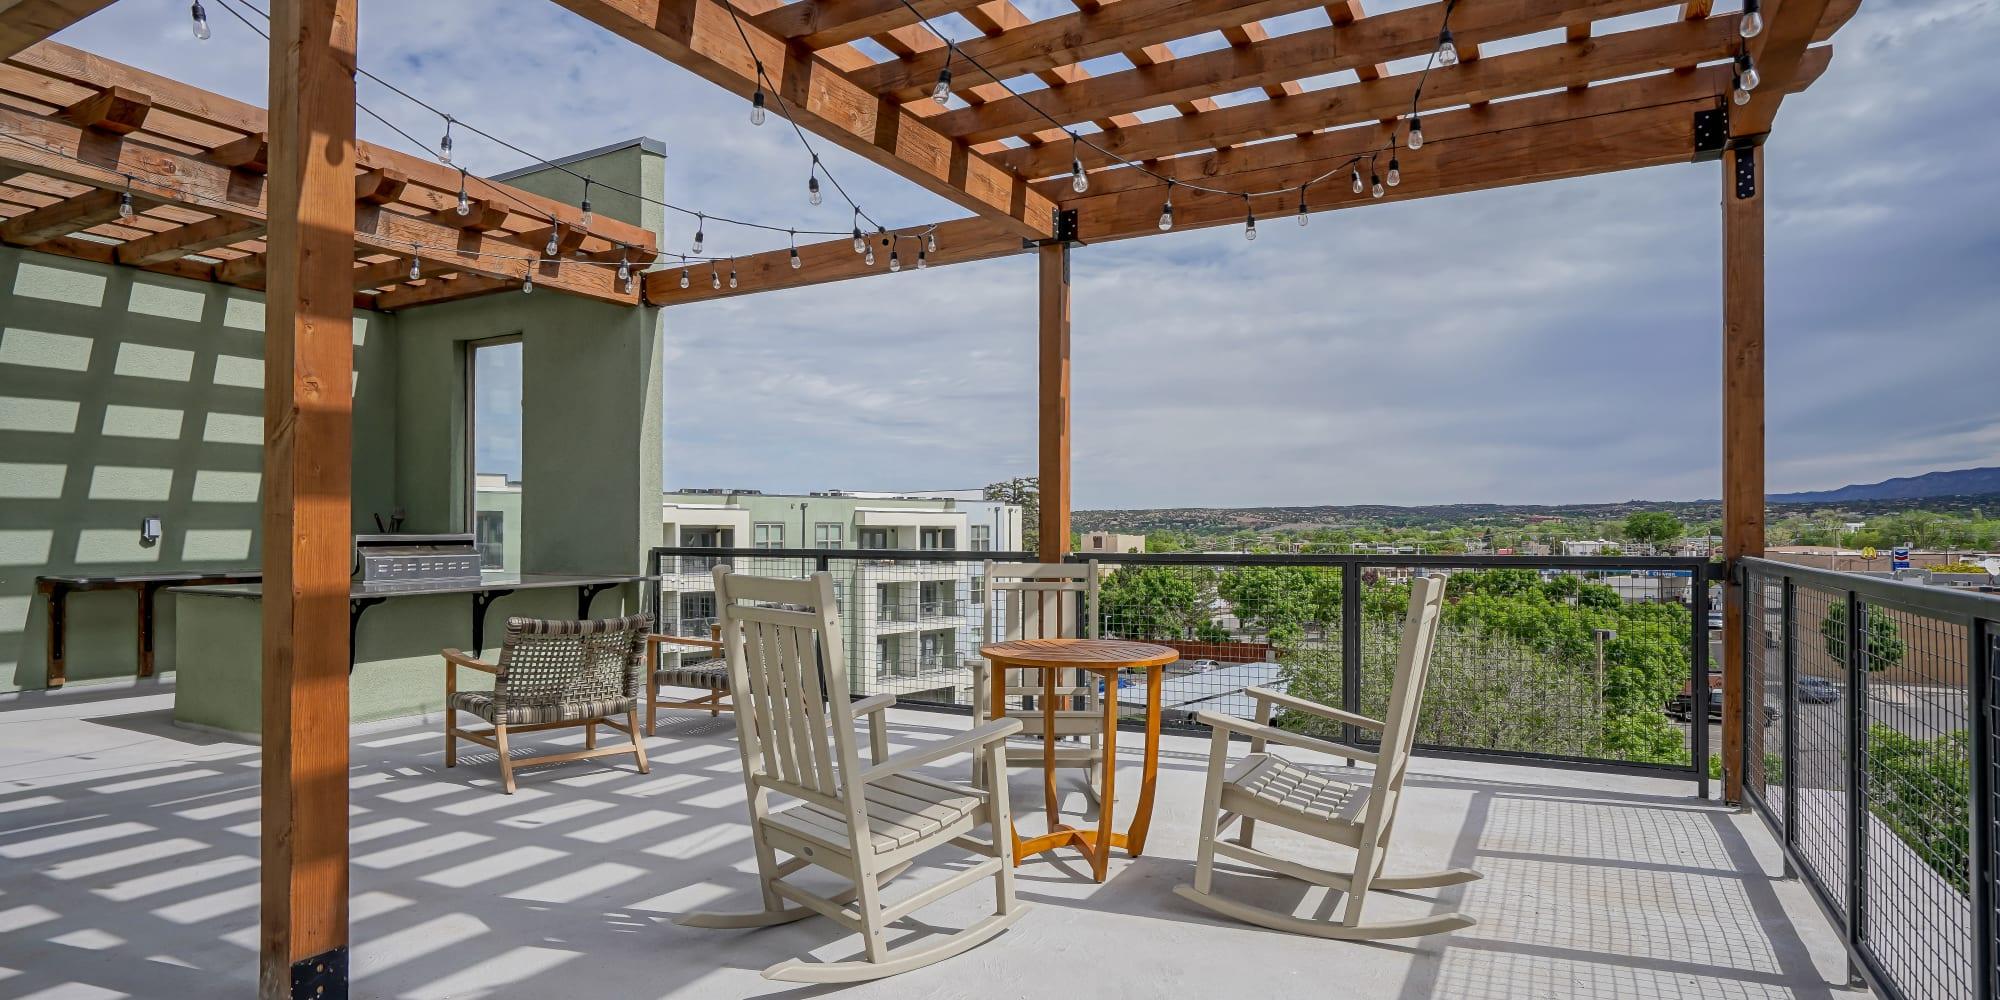 Apartments at Capitol Flats in Santa Fe, New Mexico